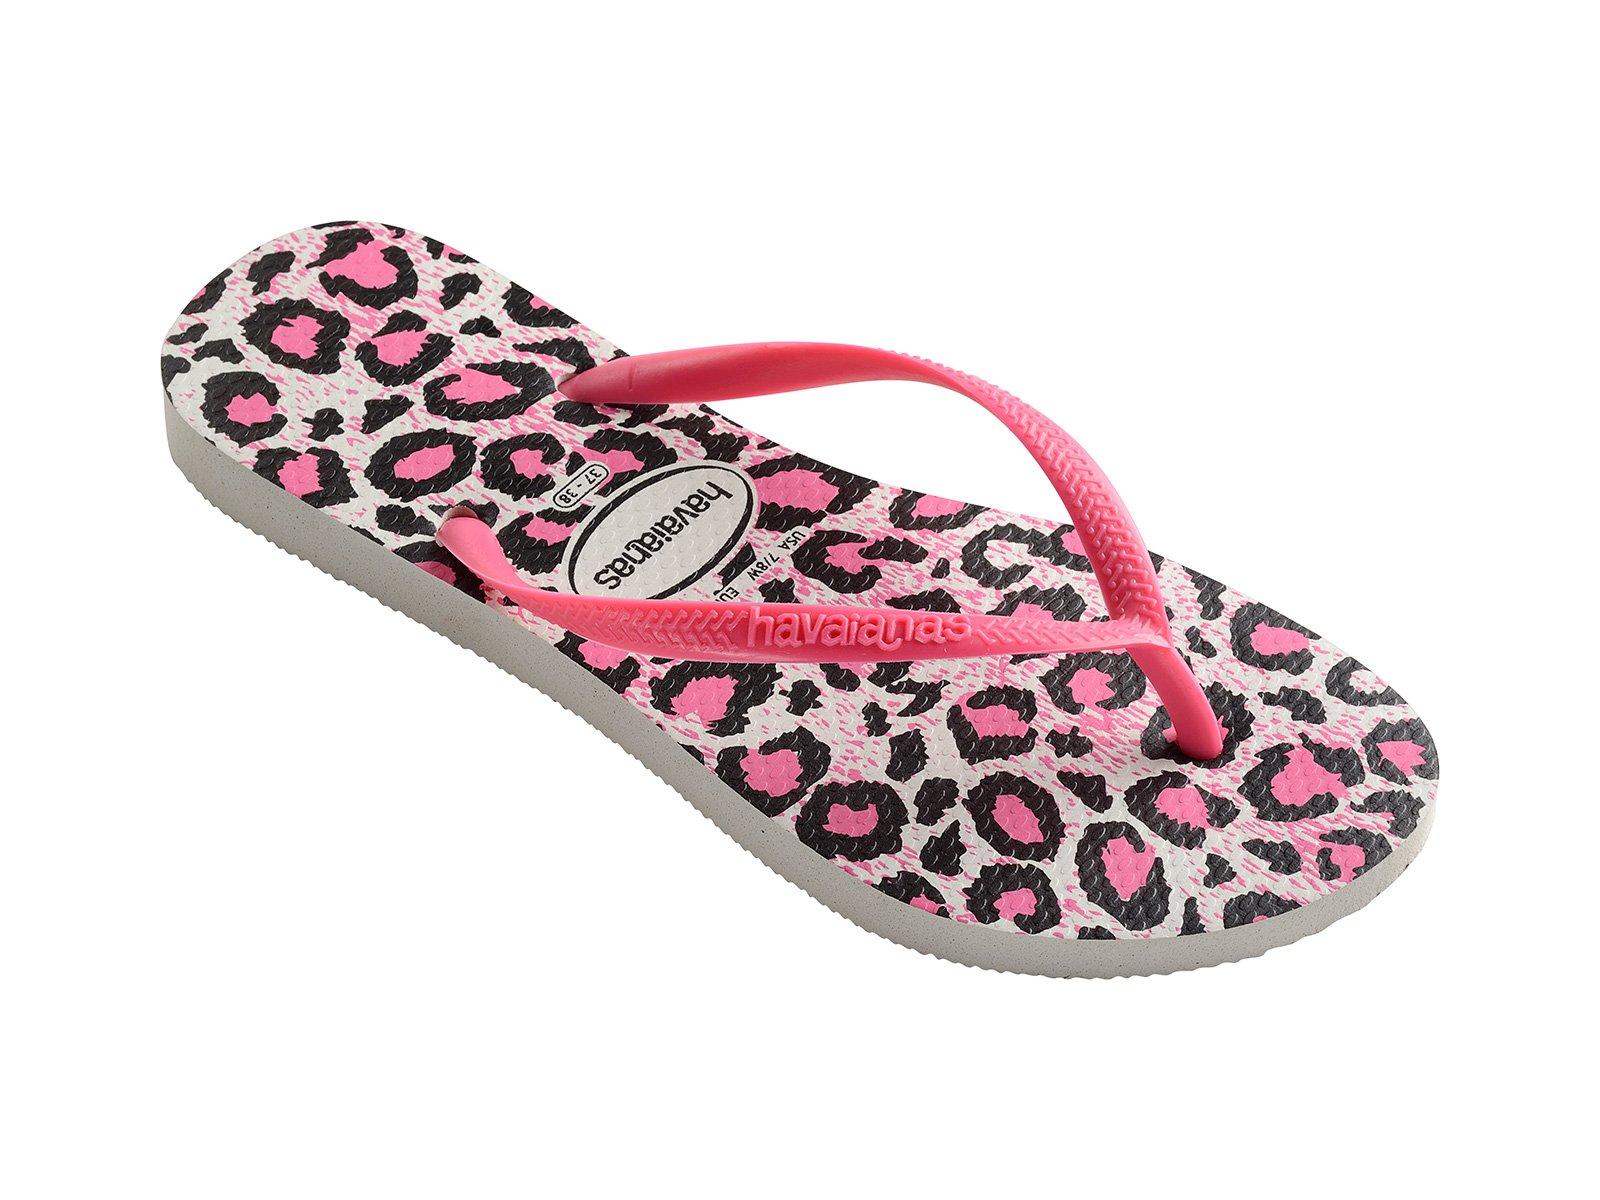 3cf4155d7 Pink And White Leopard Print Flip-flops - Slim Animals White rose -  Havaianas